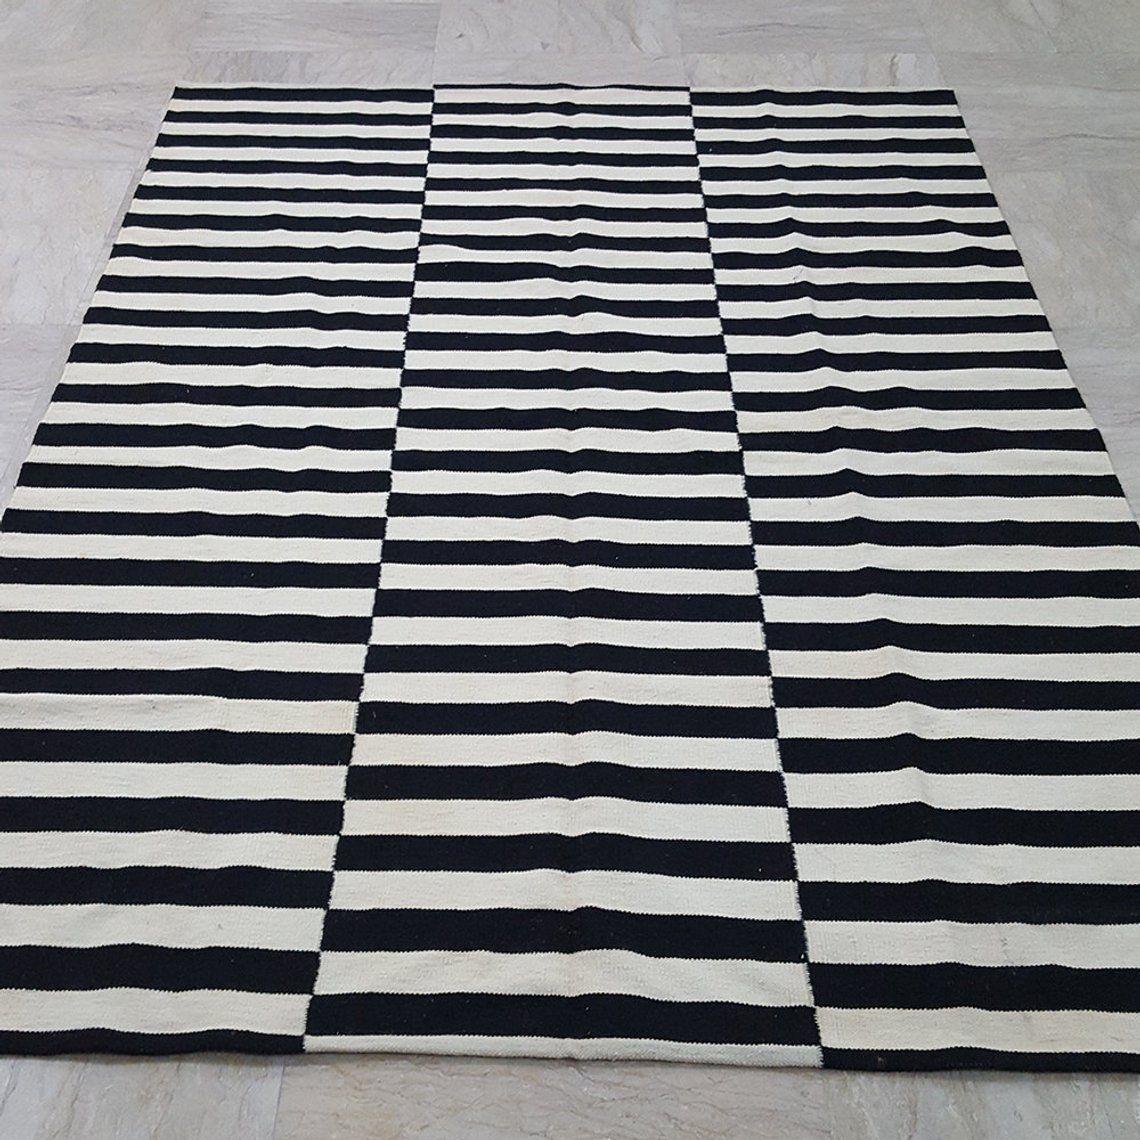 Black And White Ivory Striped Rug Handmade Striped Kilim Rug Etsy Striped Rug Striped Kilim Black And White Carpet